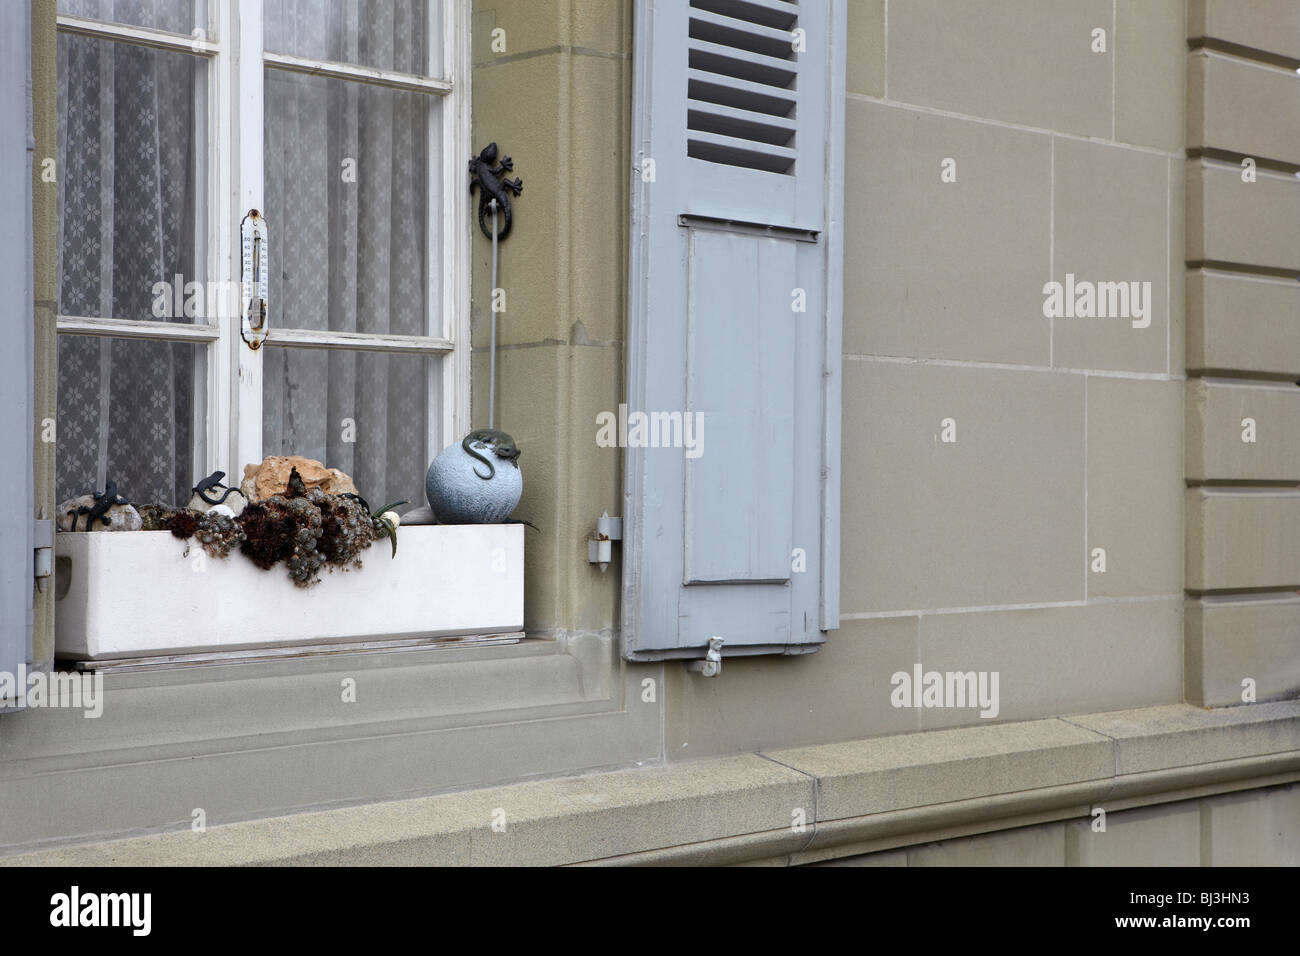 Lizards on a window box in Bern Switzerland - Stock Image